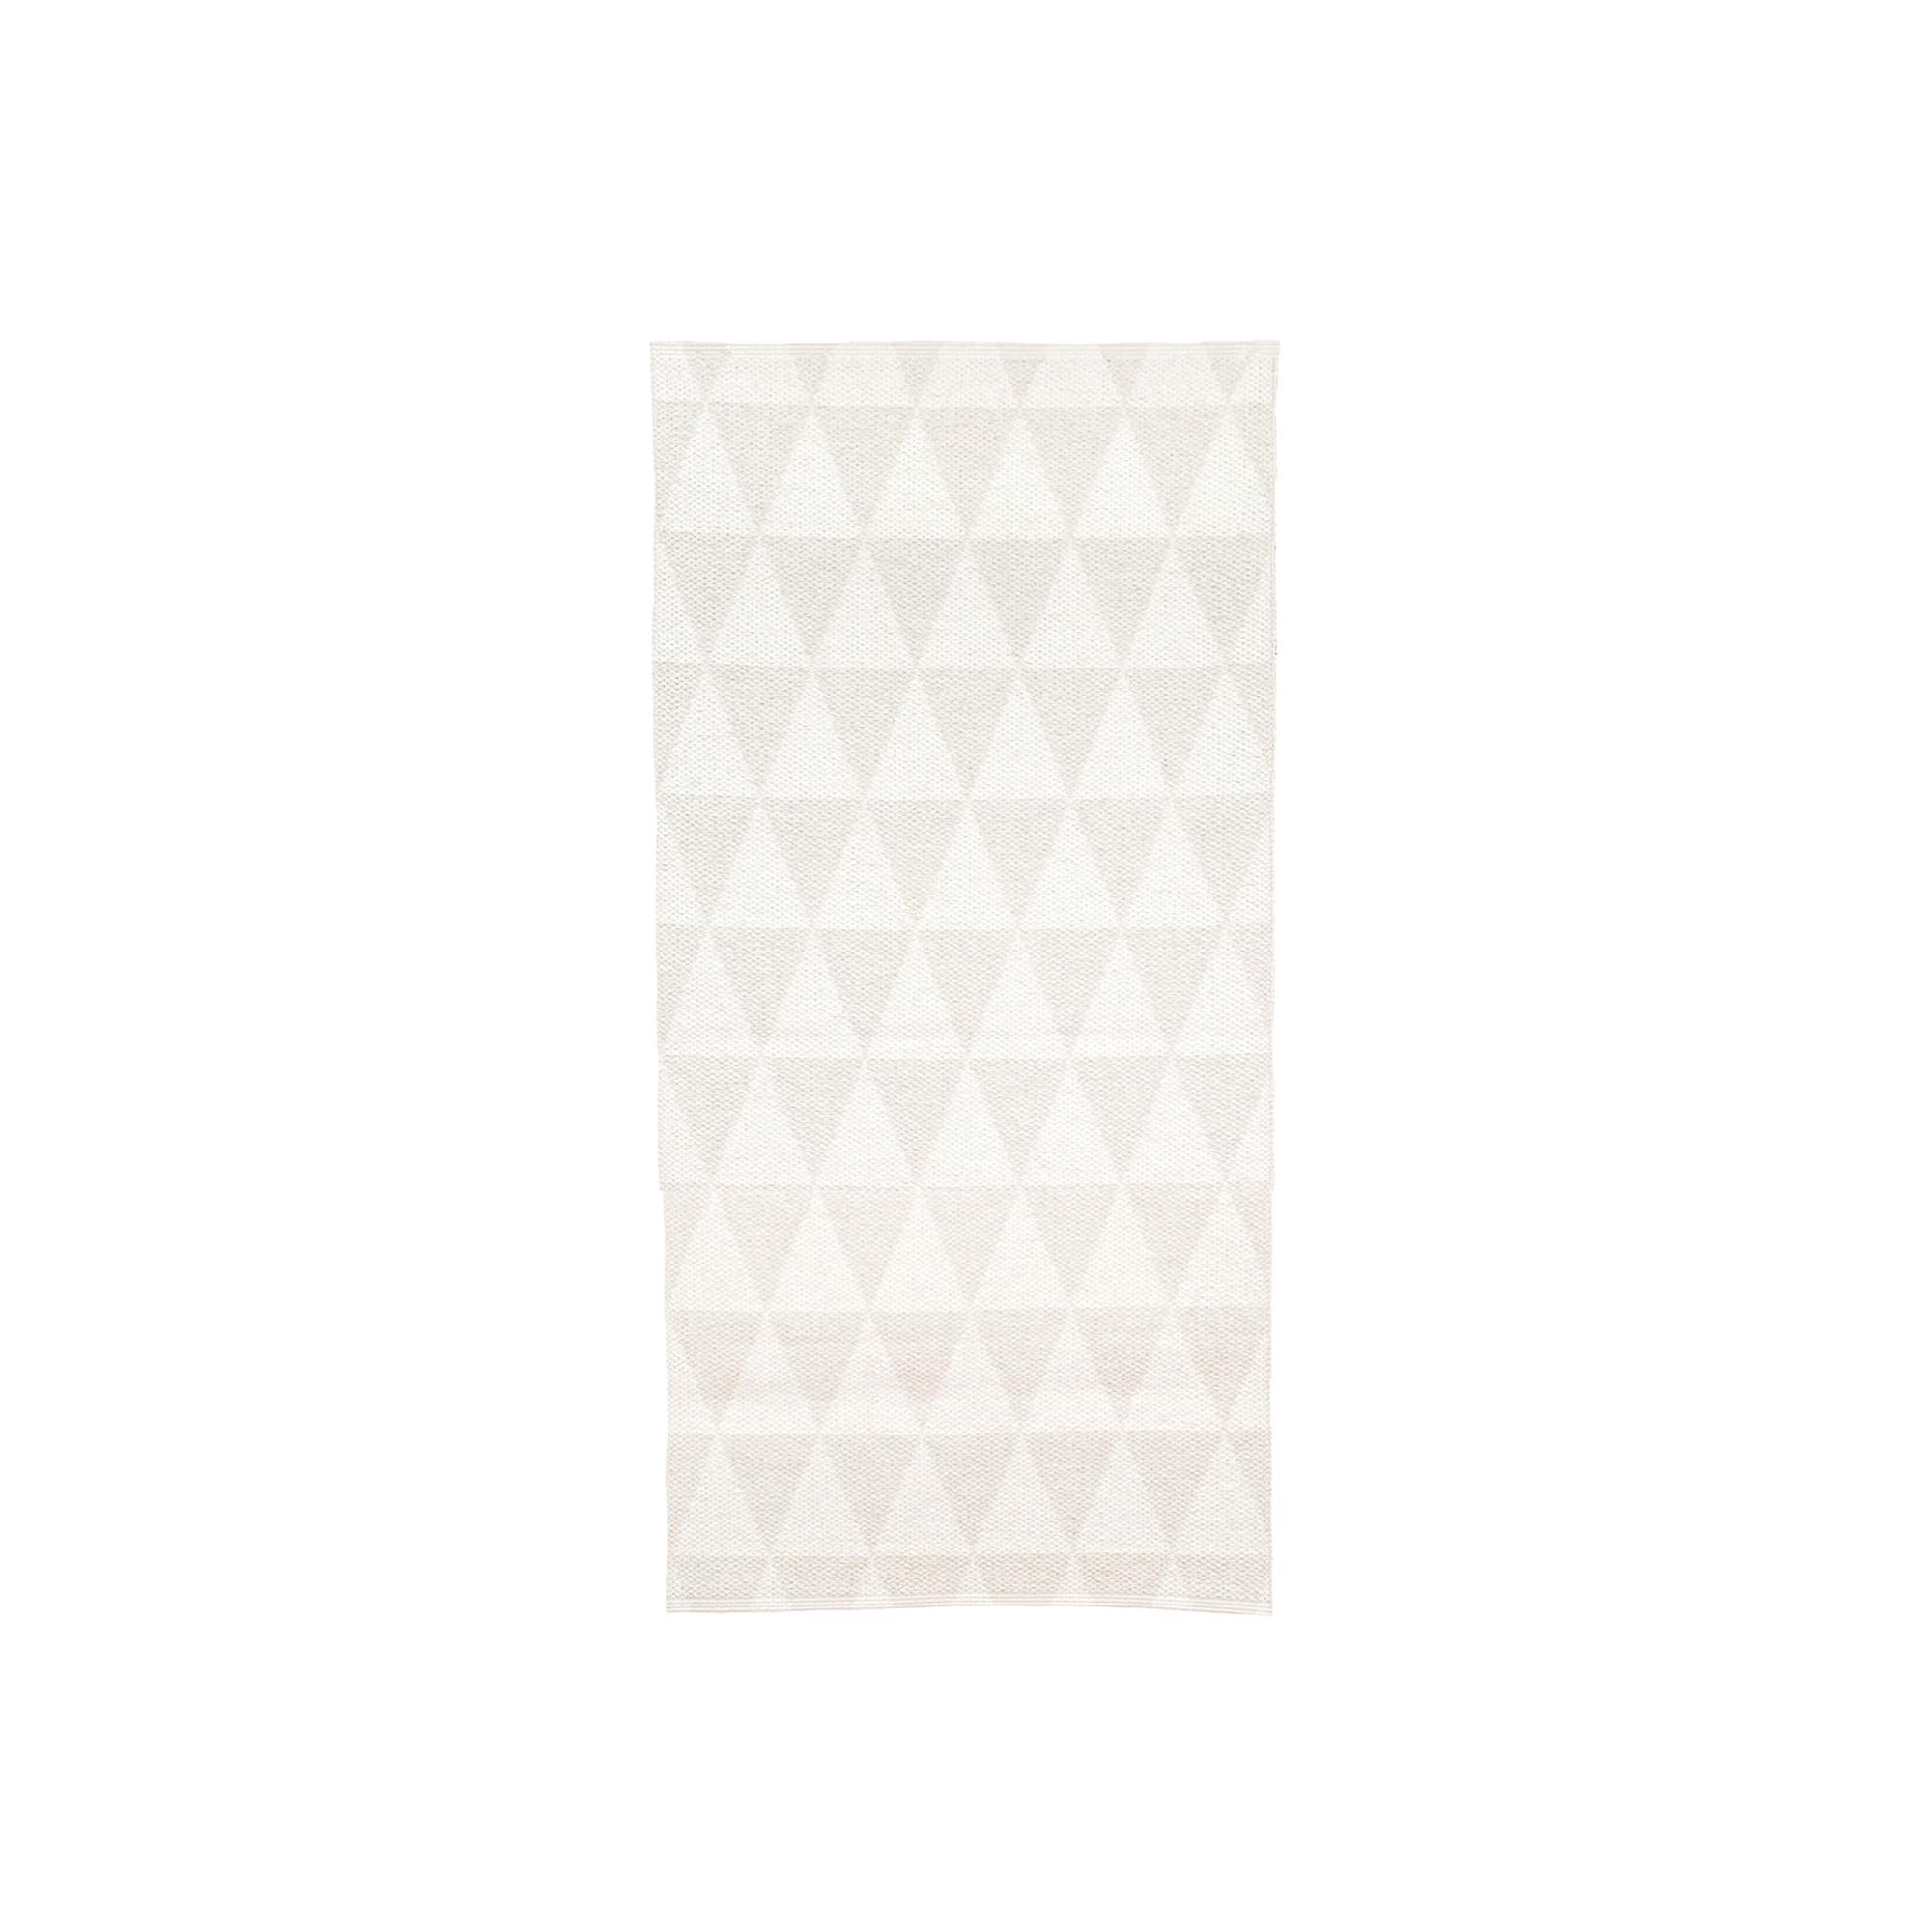 Designtorget Plastmatta Assar 150 vit/vit